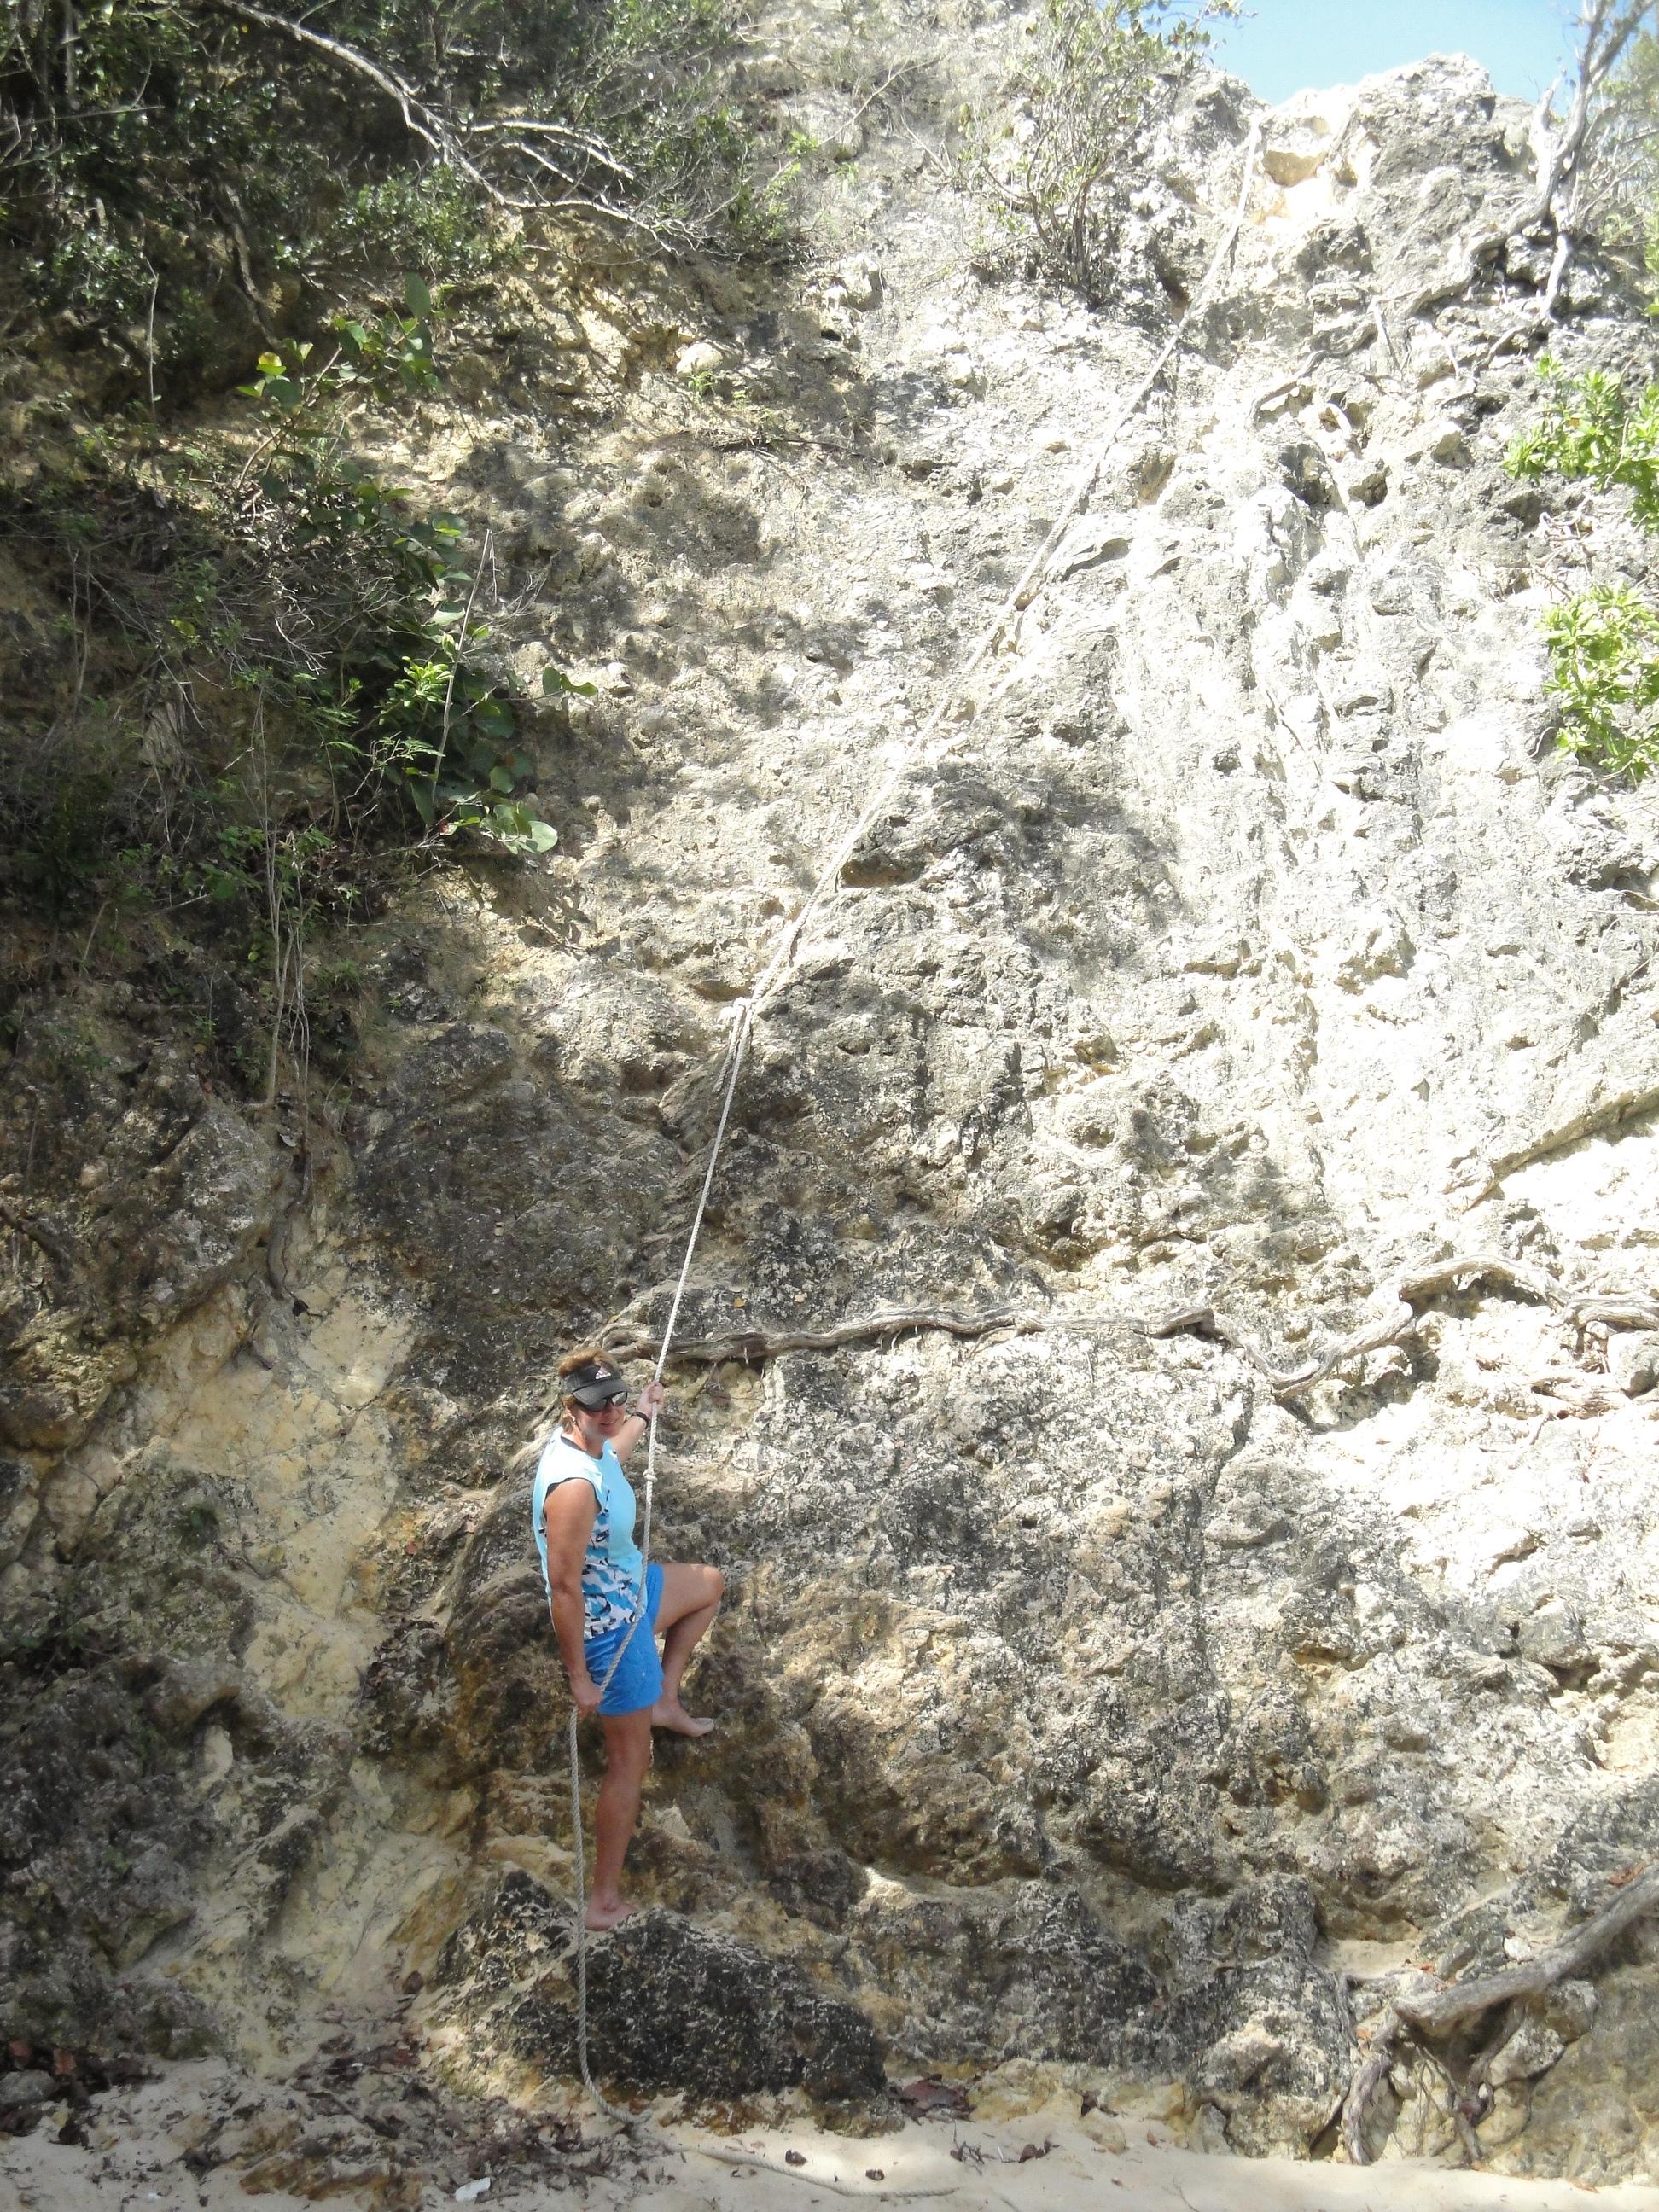 Little Bay down climb, Anguilla.